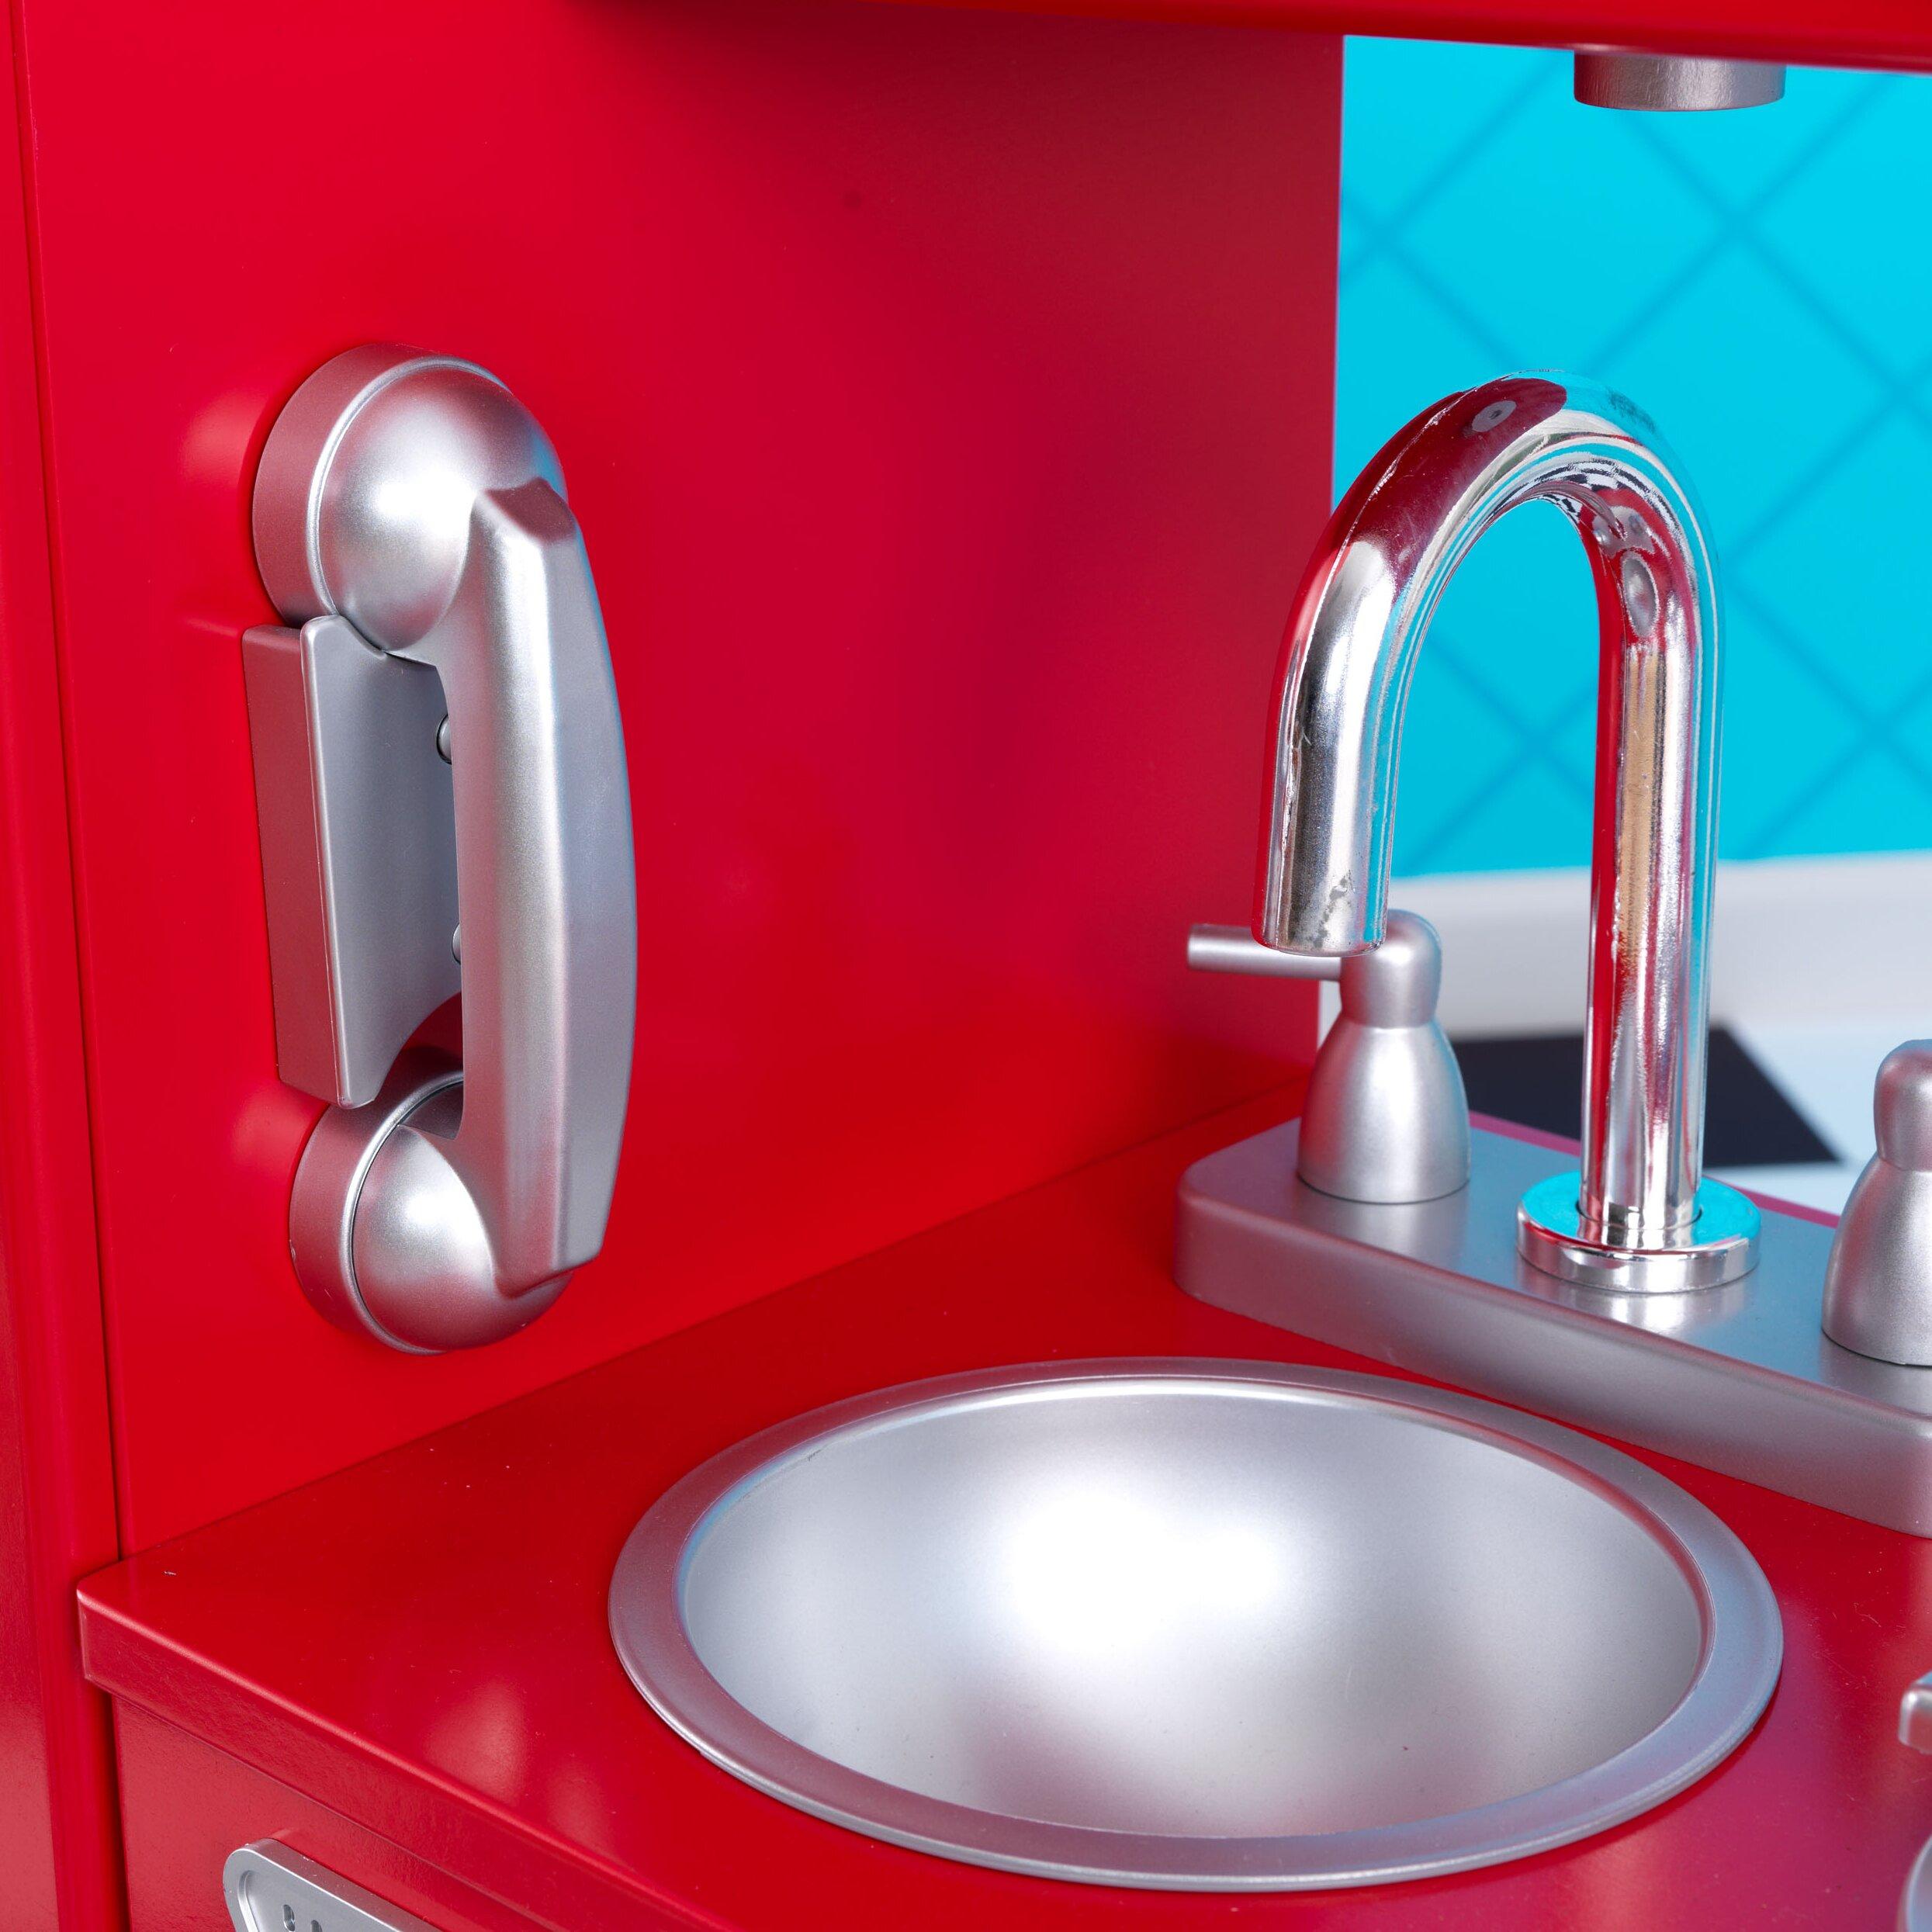 Kidkraft Red Vintage Kitchen 53173: KidKraft Personalized Red Vintage Kitchen & Reviews